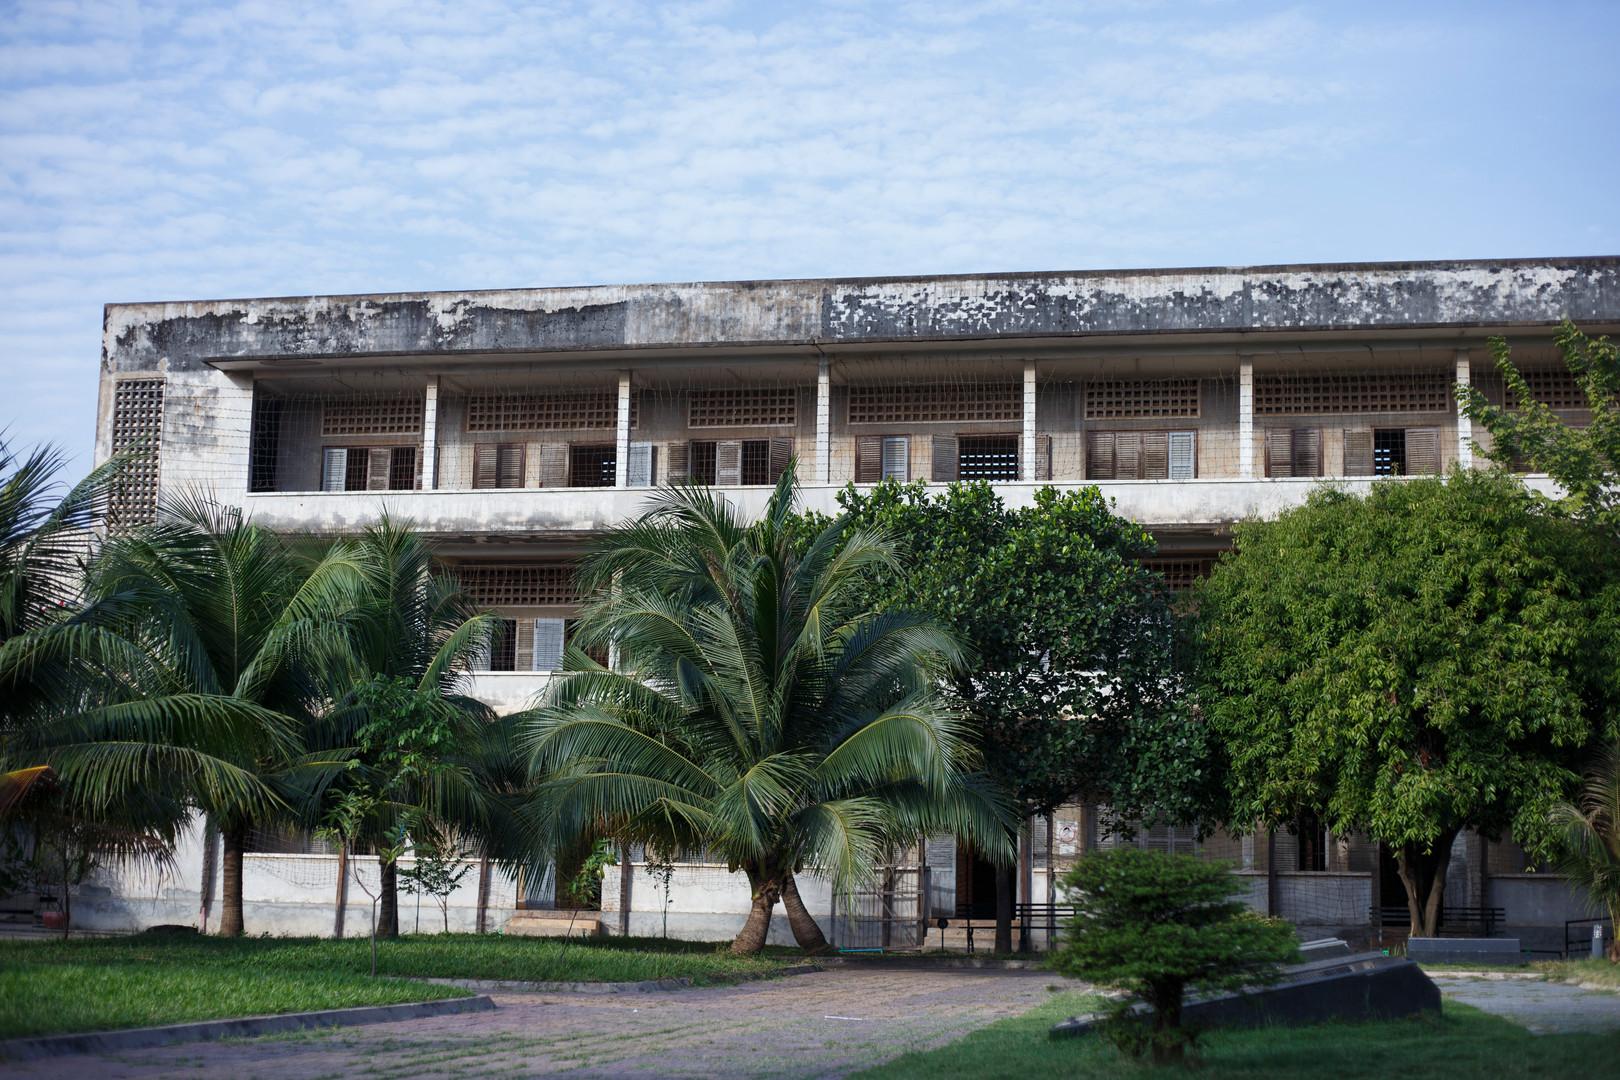 Main building at Tuol Sleng Genocide Museum, Phnom Penh, Cambodia